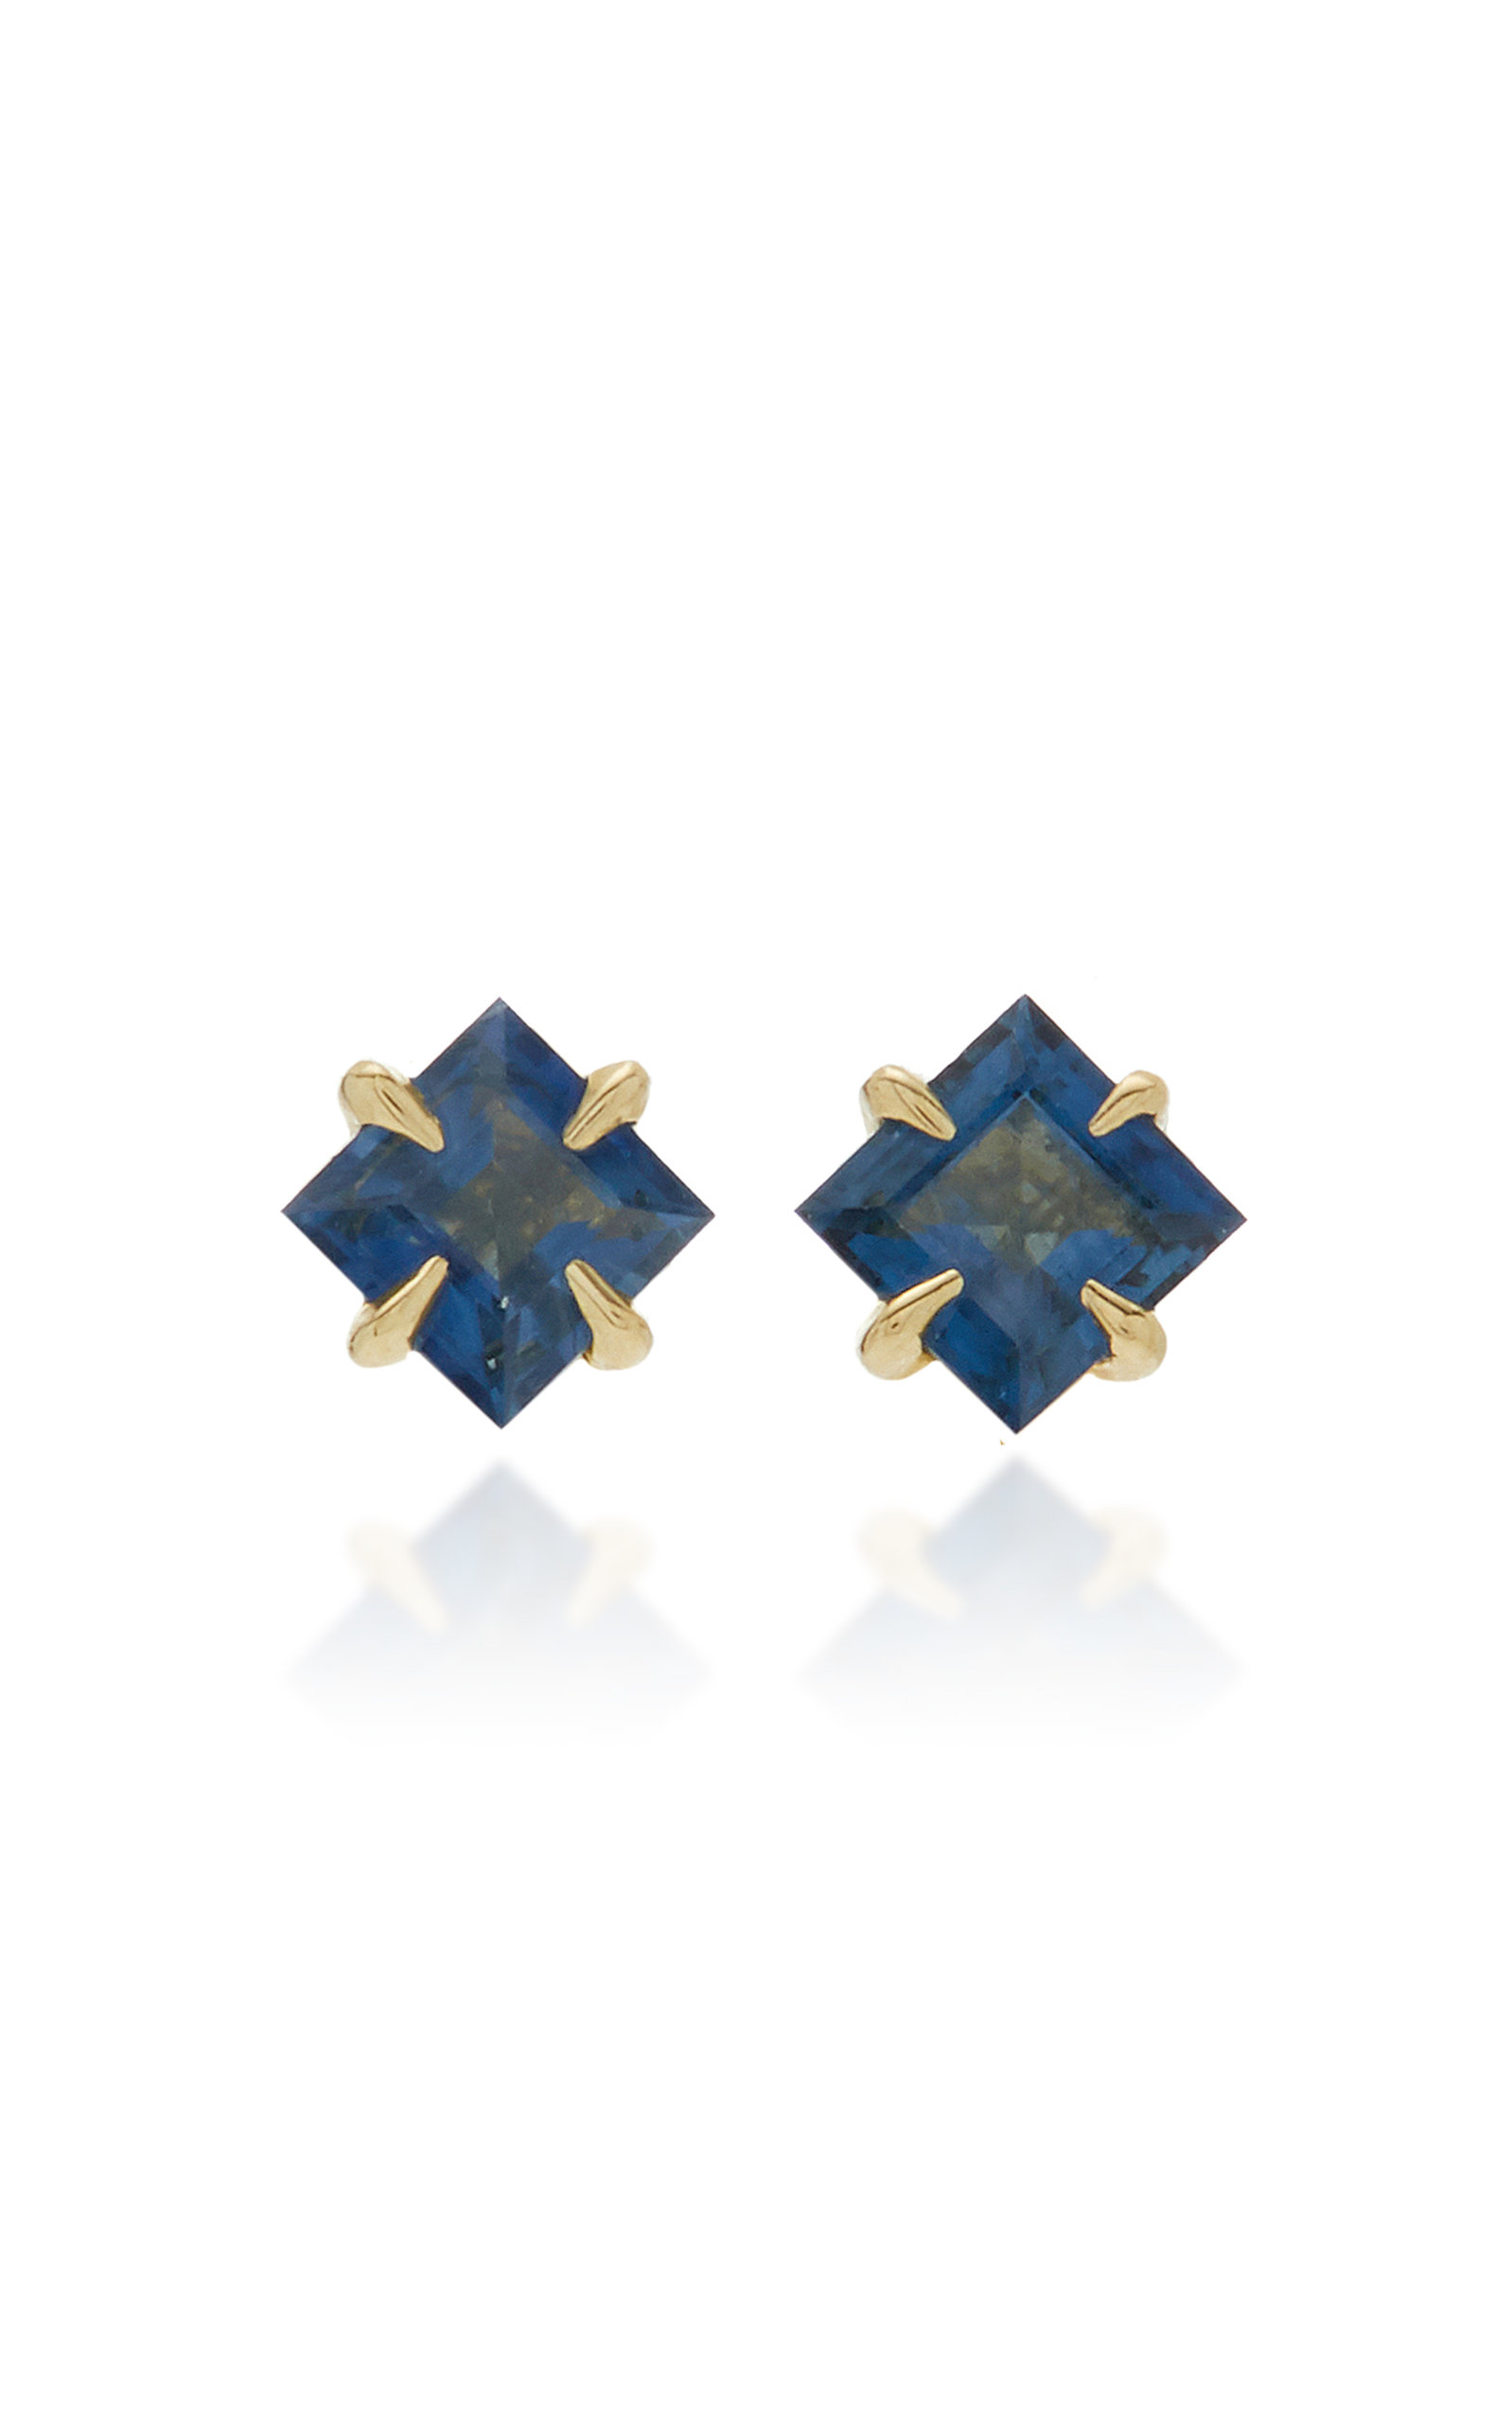 Women's Primary Princess 14K Gold Blue Sapphire Earrings